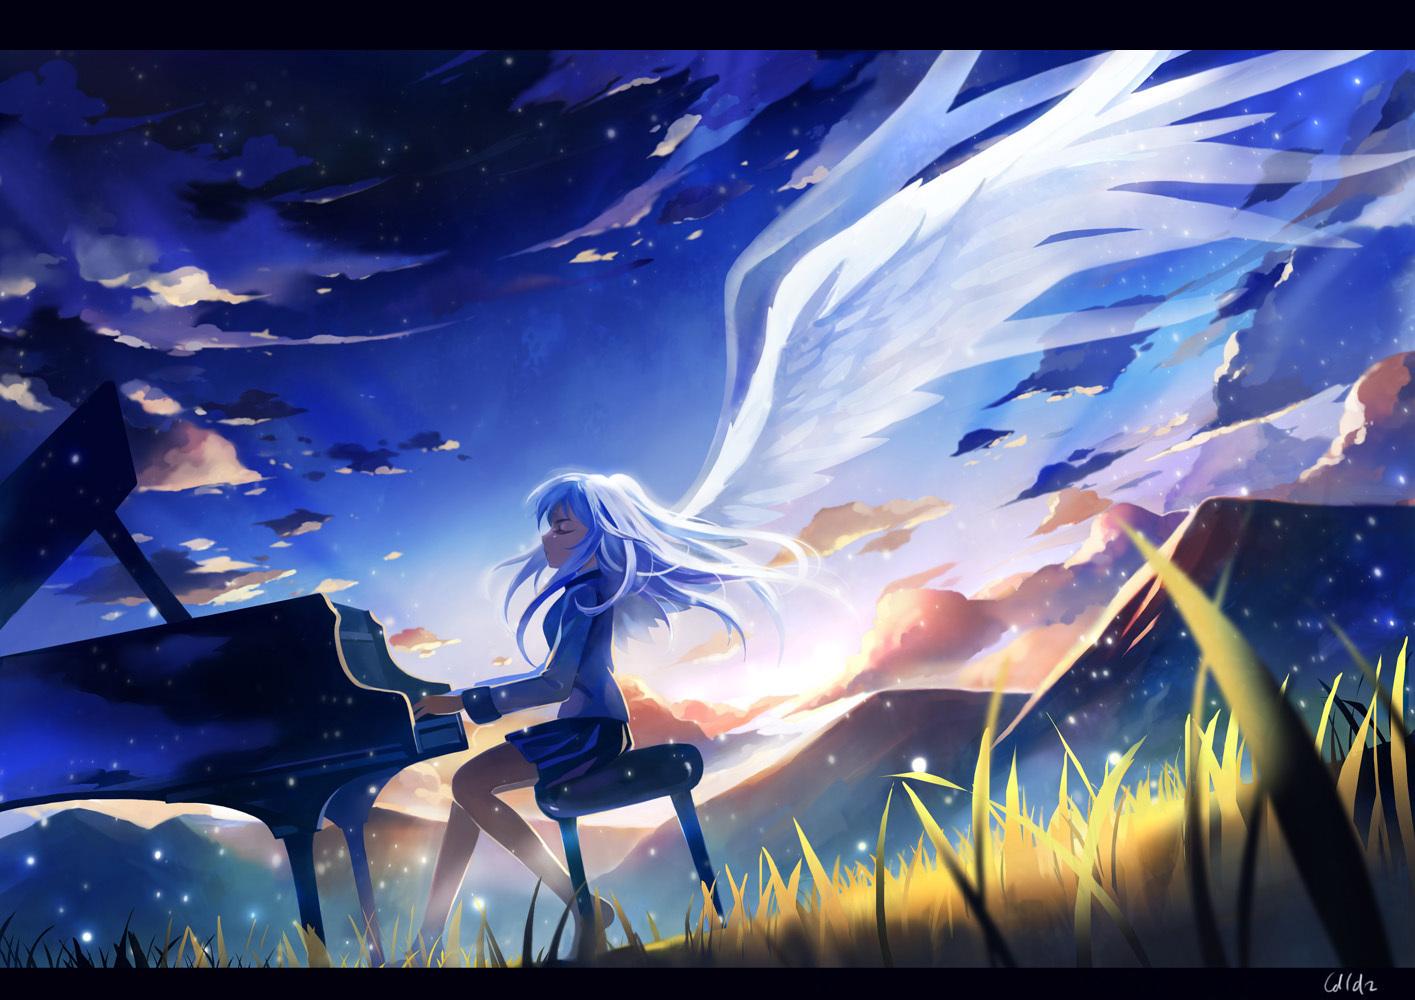 http://1.bp.blogspot.com/-17niu7s3BNg/T80uhZqzzjI/AAAAAAAAAEg/6bBPFnz6MCc/s1600/Angel_Beats!.jpg